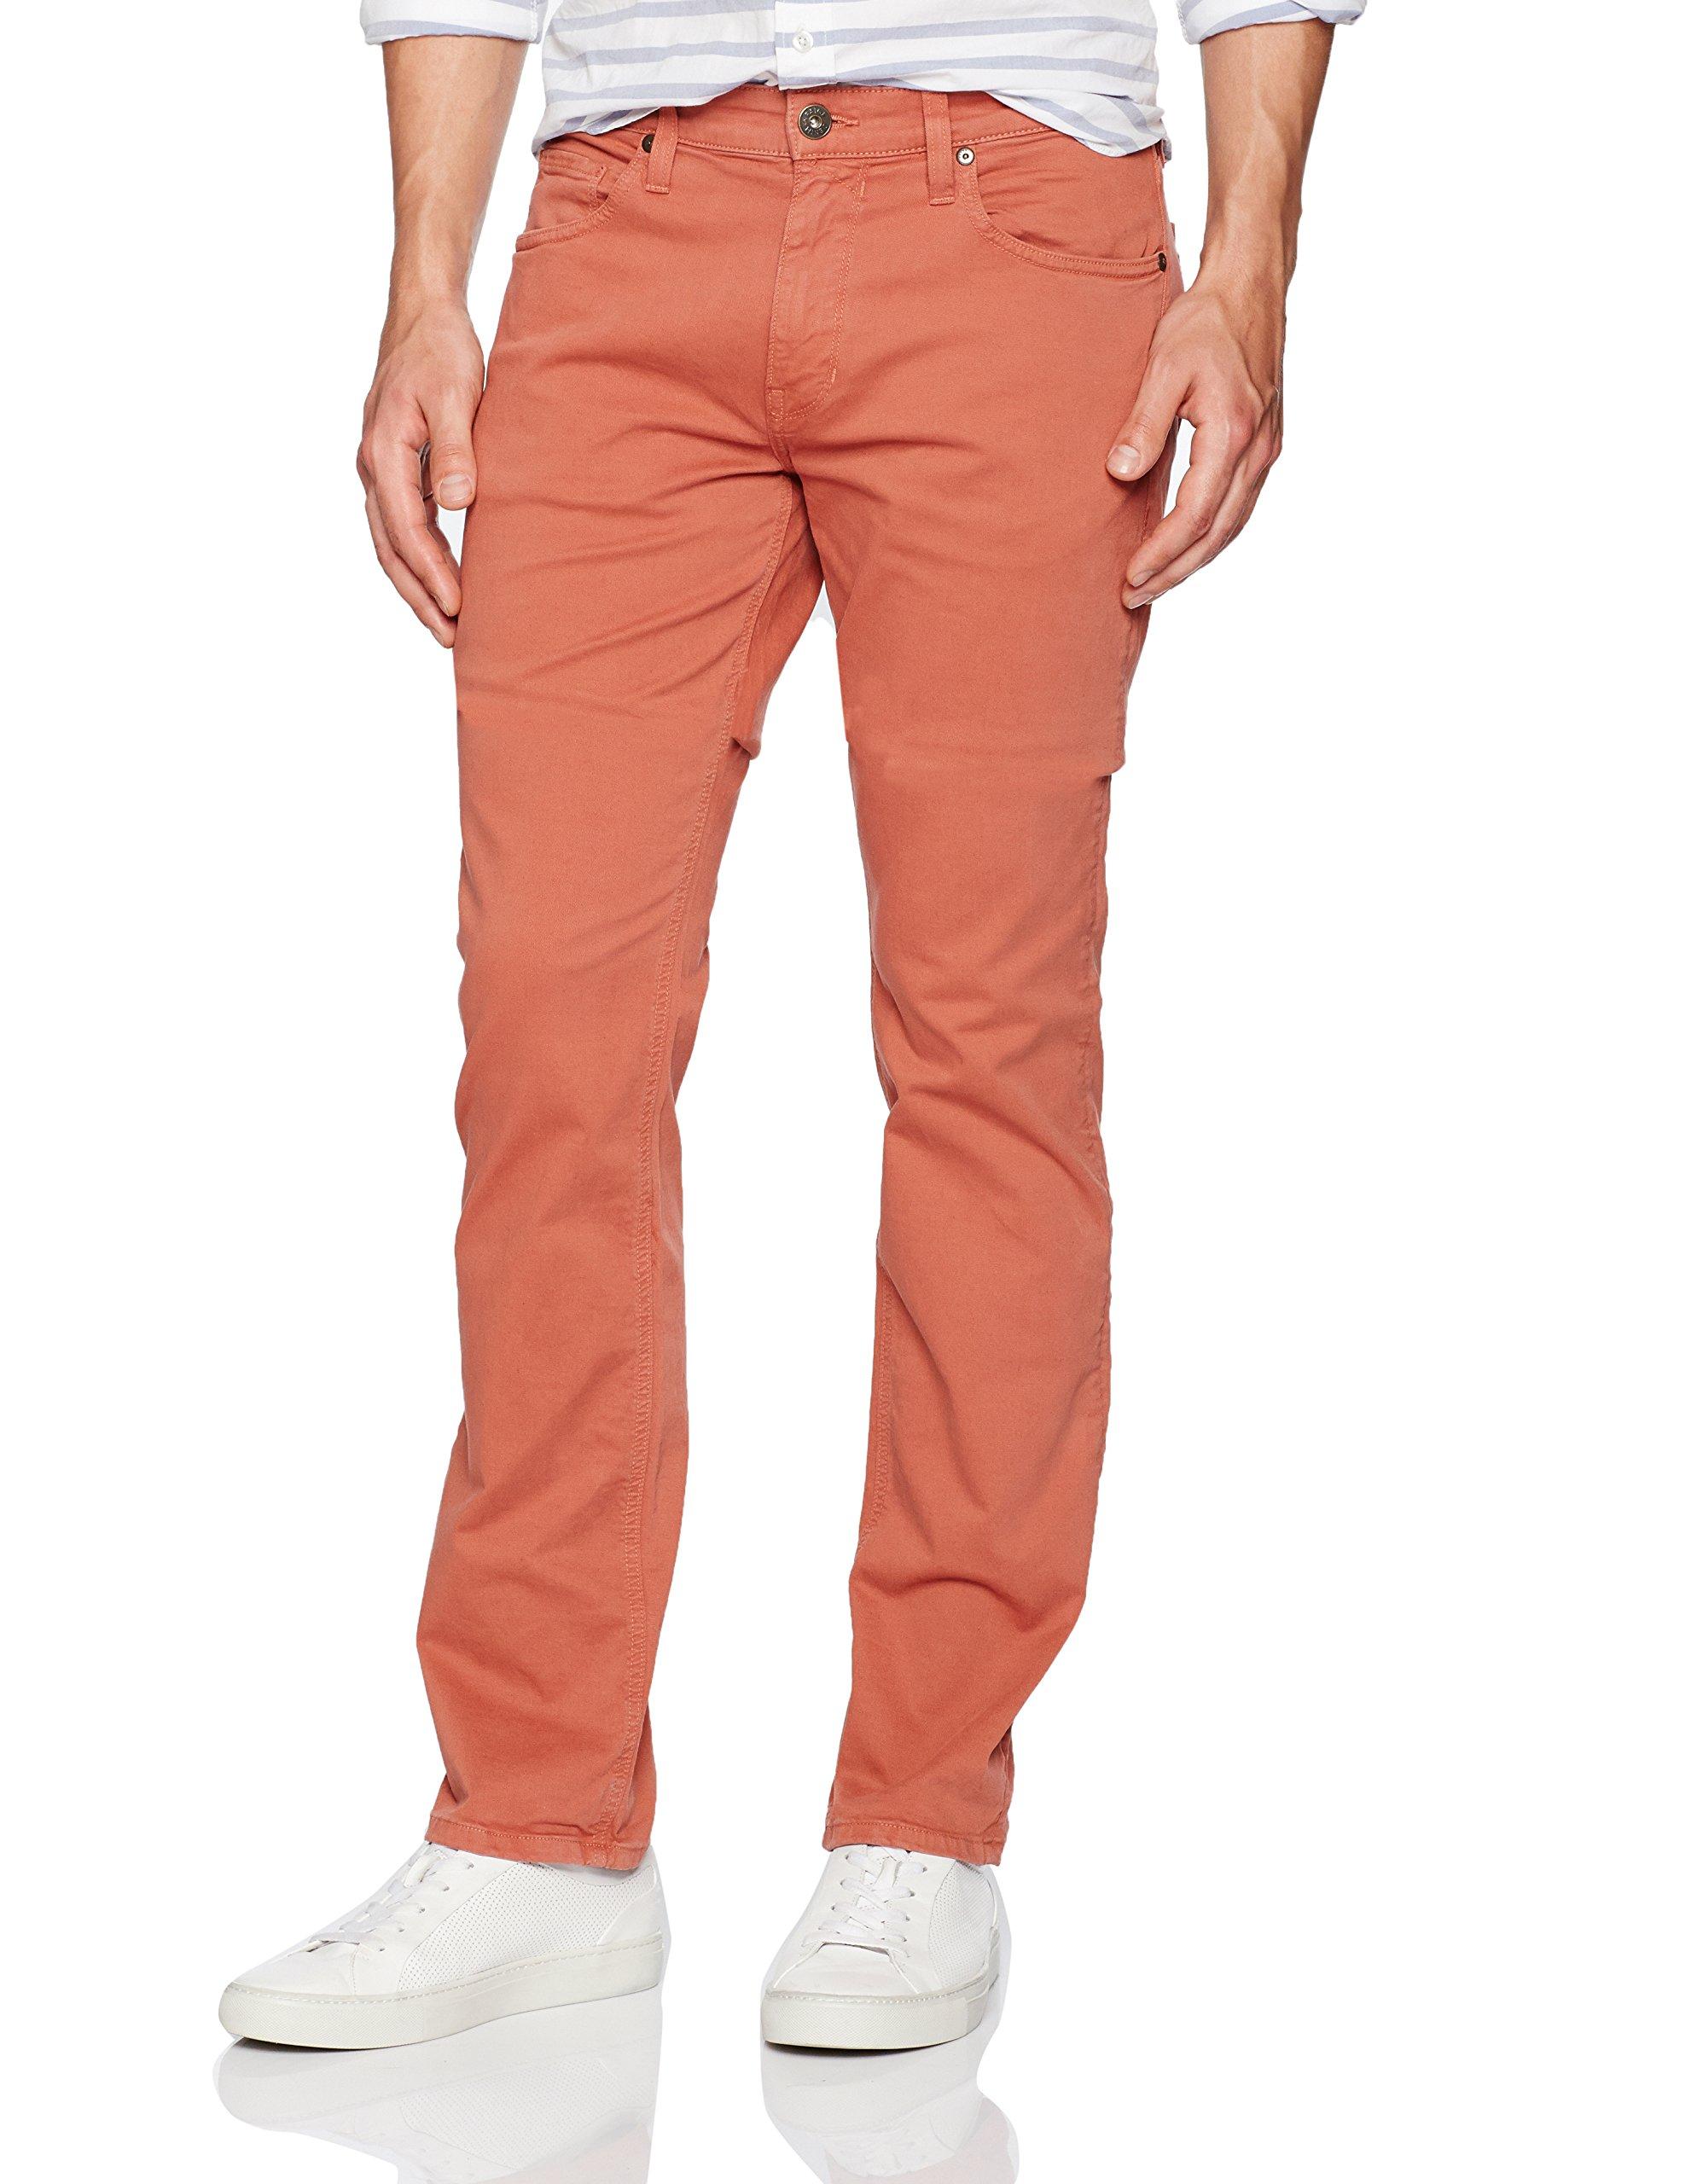 PAIGE Men's Normandie Slim Straight Pants, Ginger Root, 36